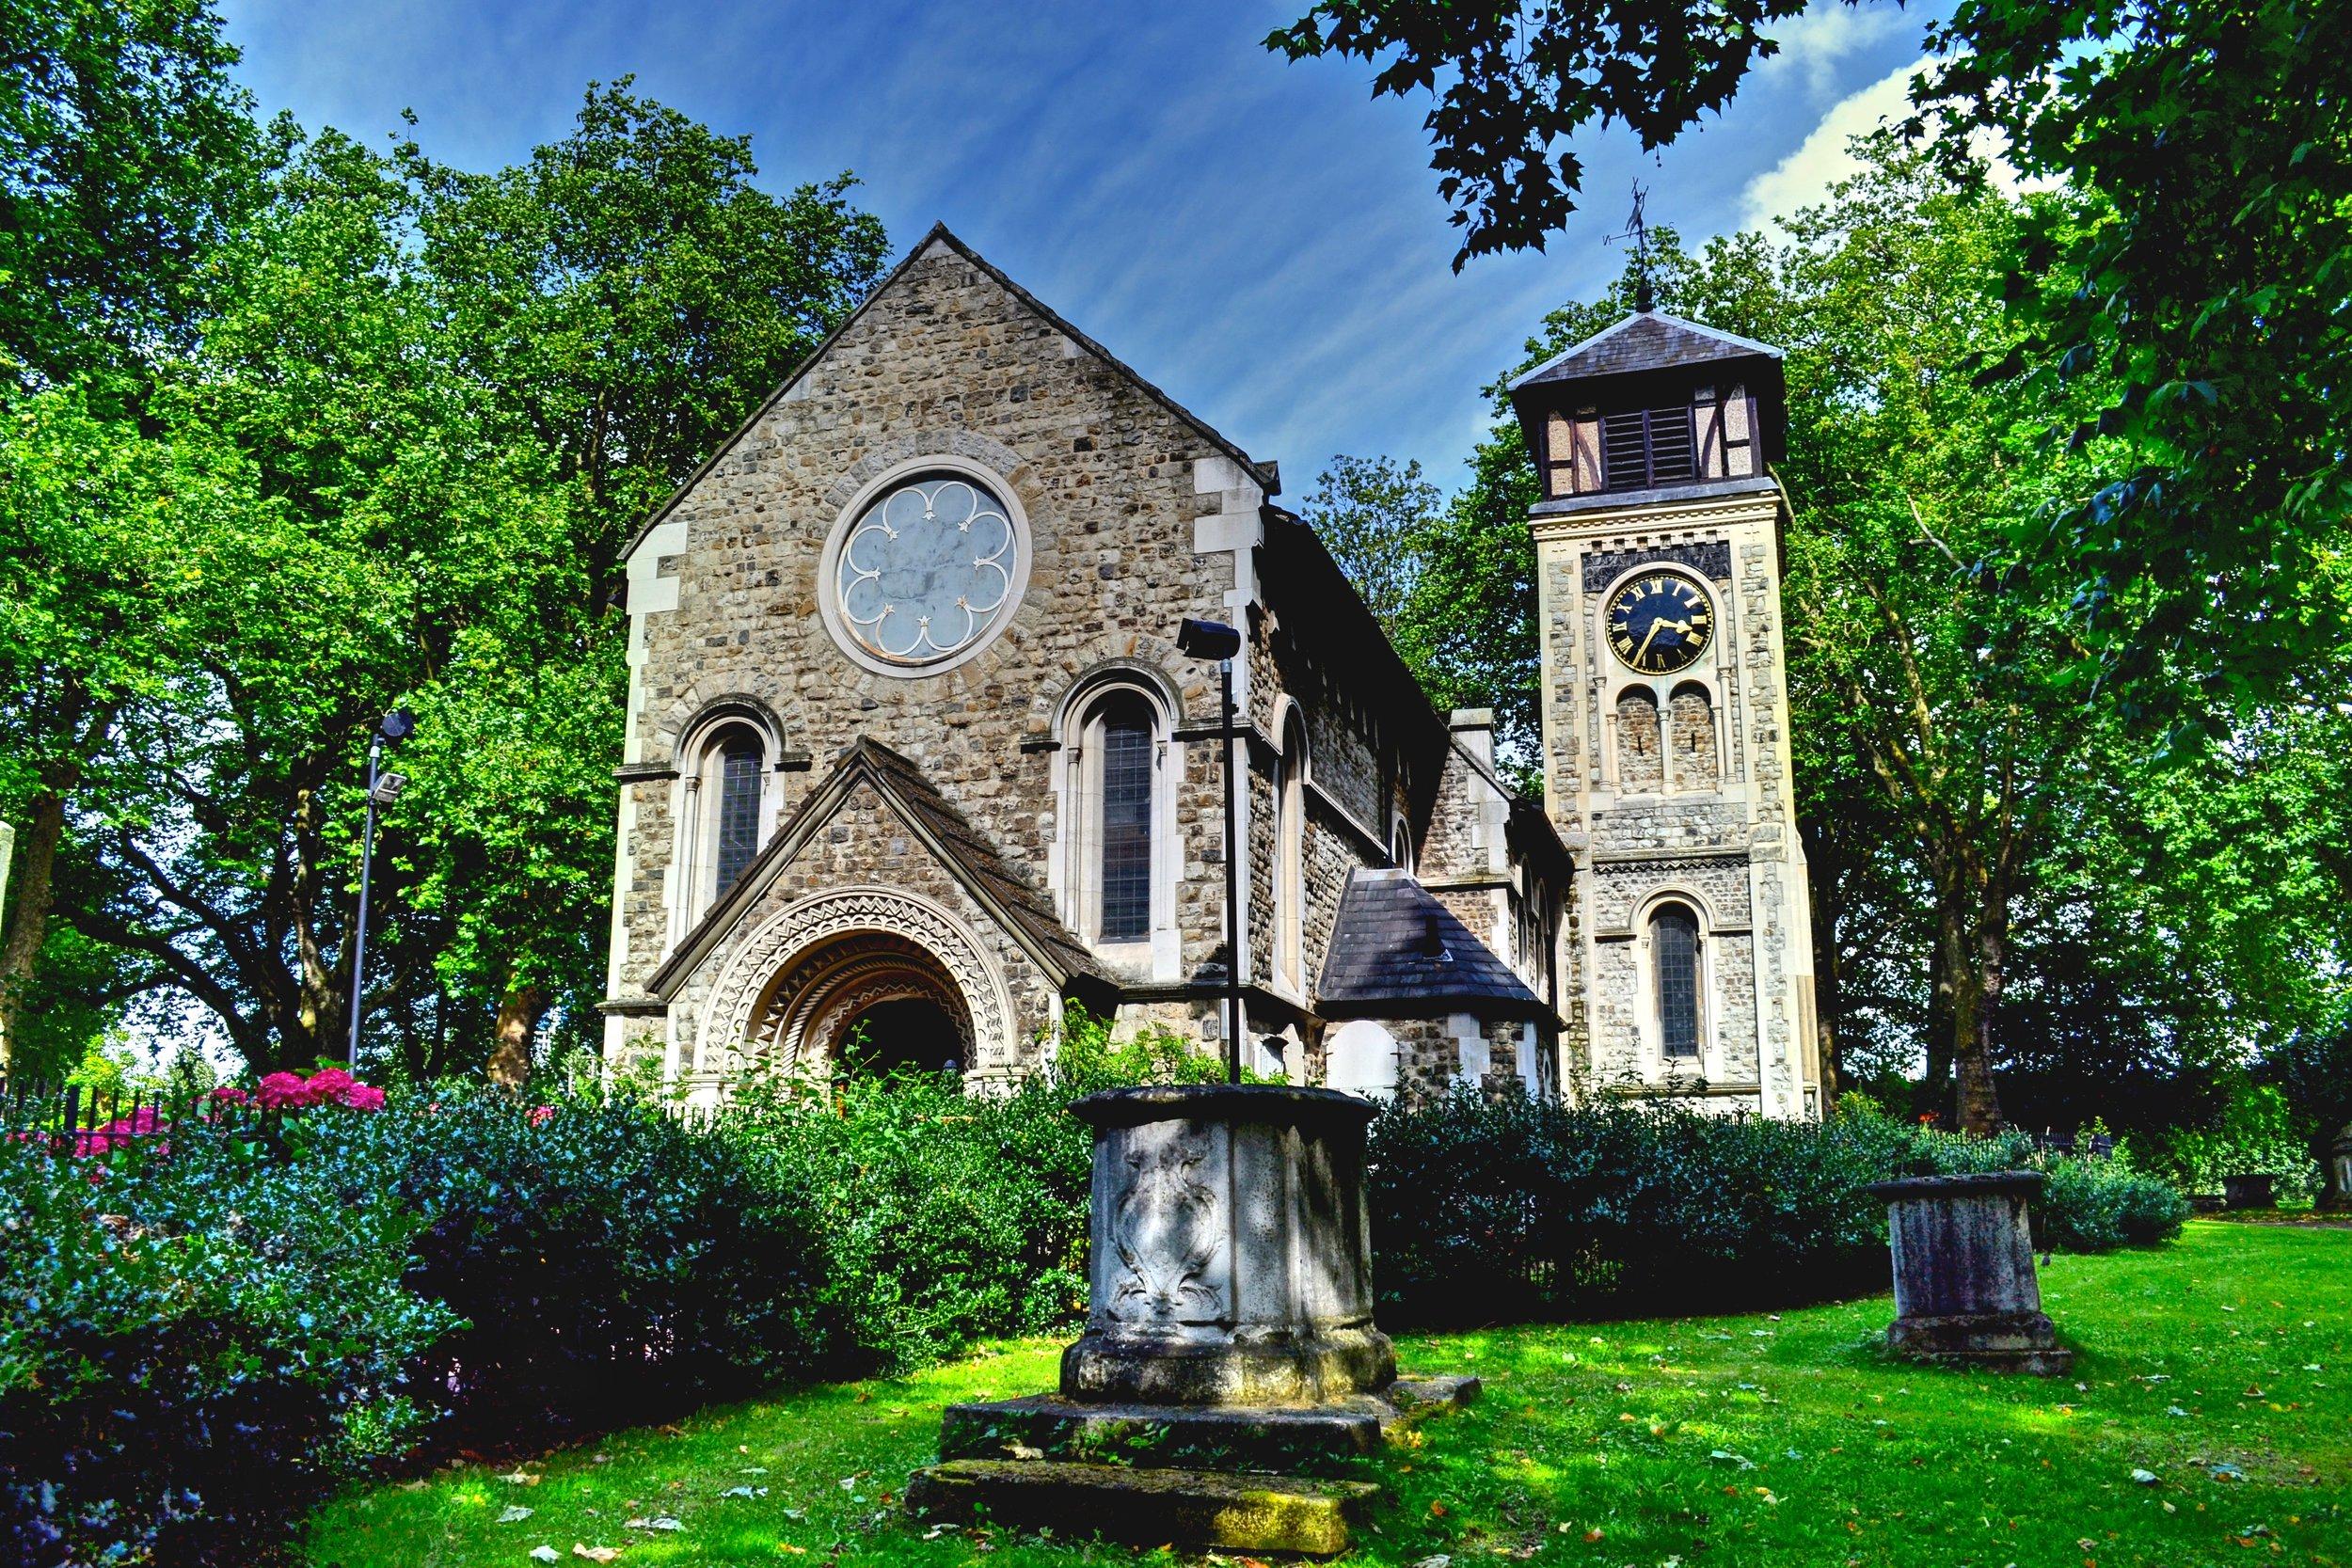 4th-century-church-old-st-pancras-london-uk.jpg